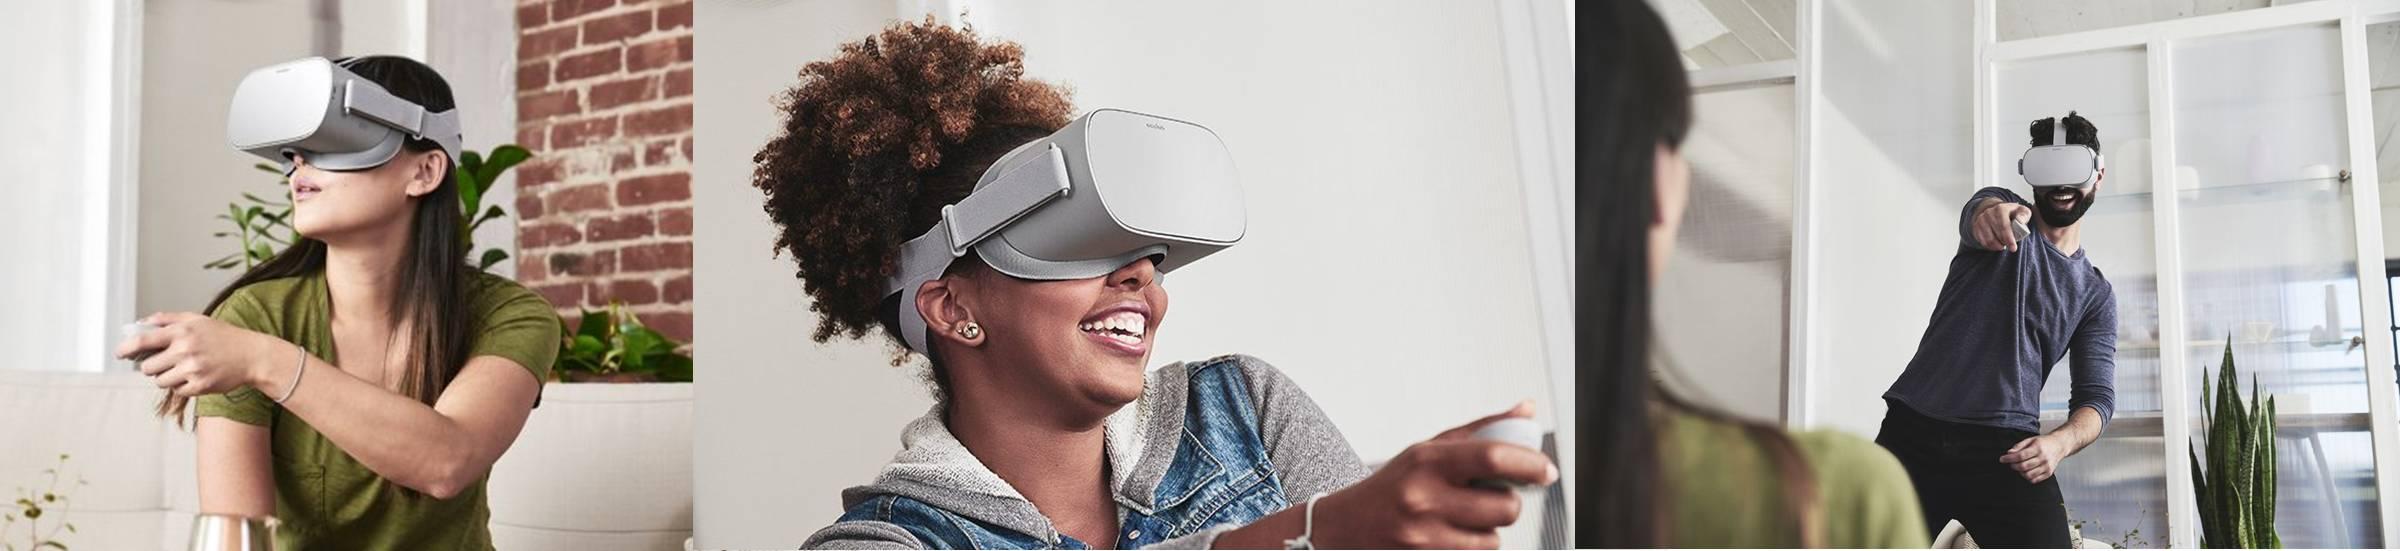 Oculus Go Virtual Reality gaming in Houston, Texas